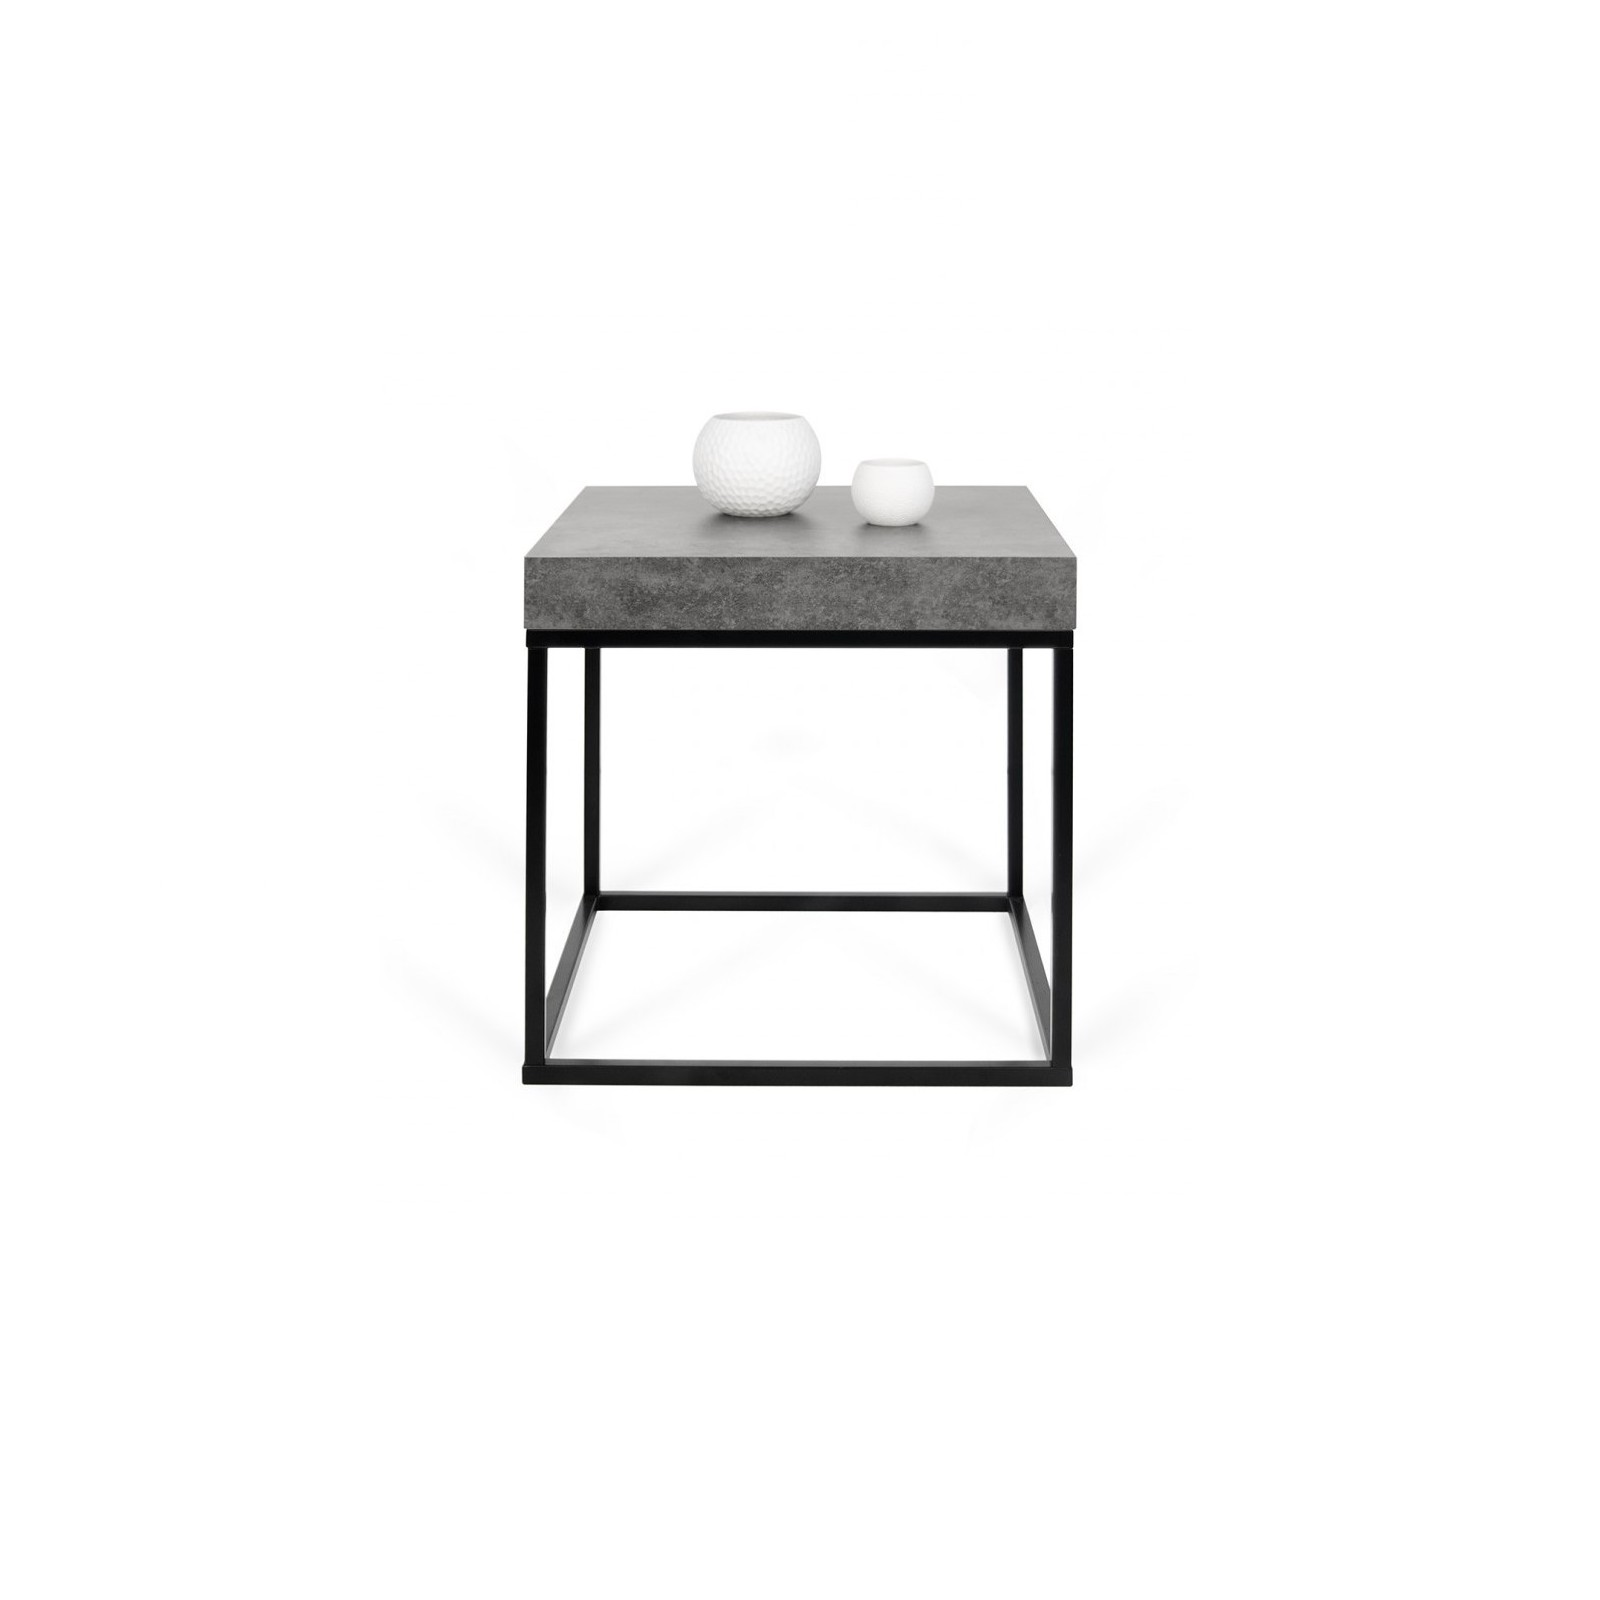 Table Basse Beton Arne Concept